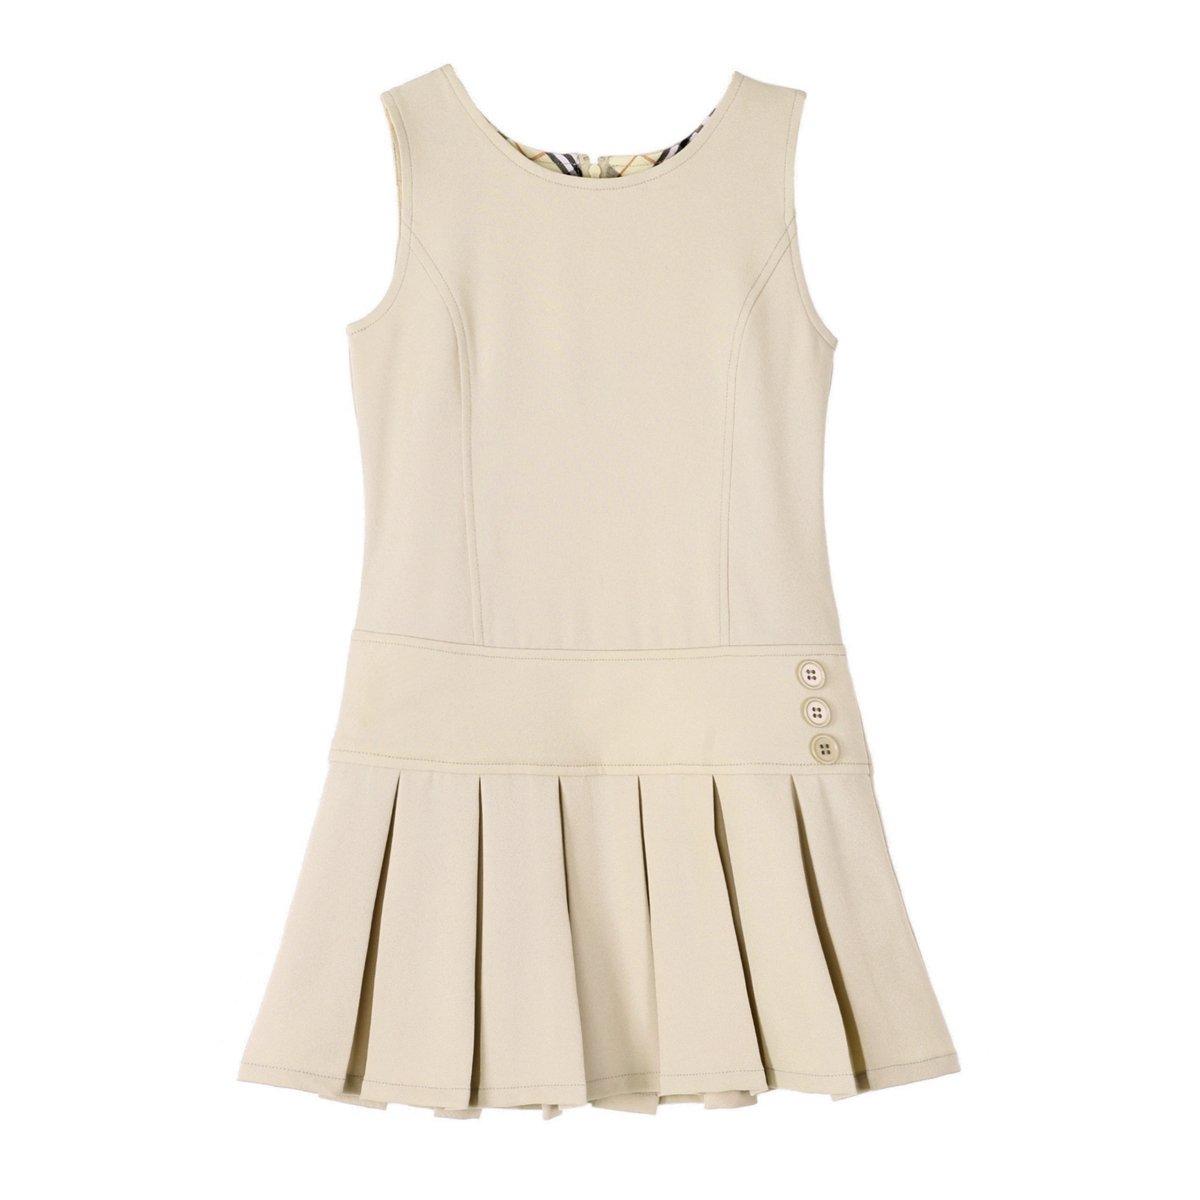 Bienzoe Girl's Stretchy Pleated Hem School Uniforms Jumper Khaki 5